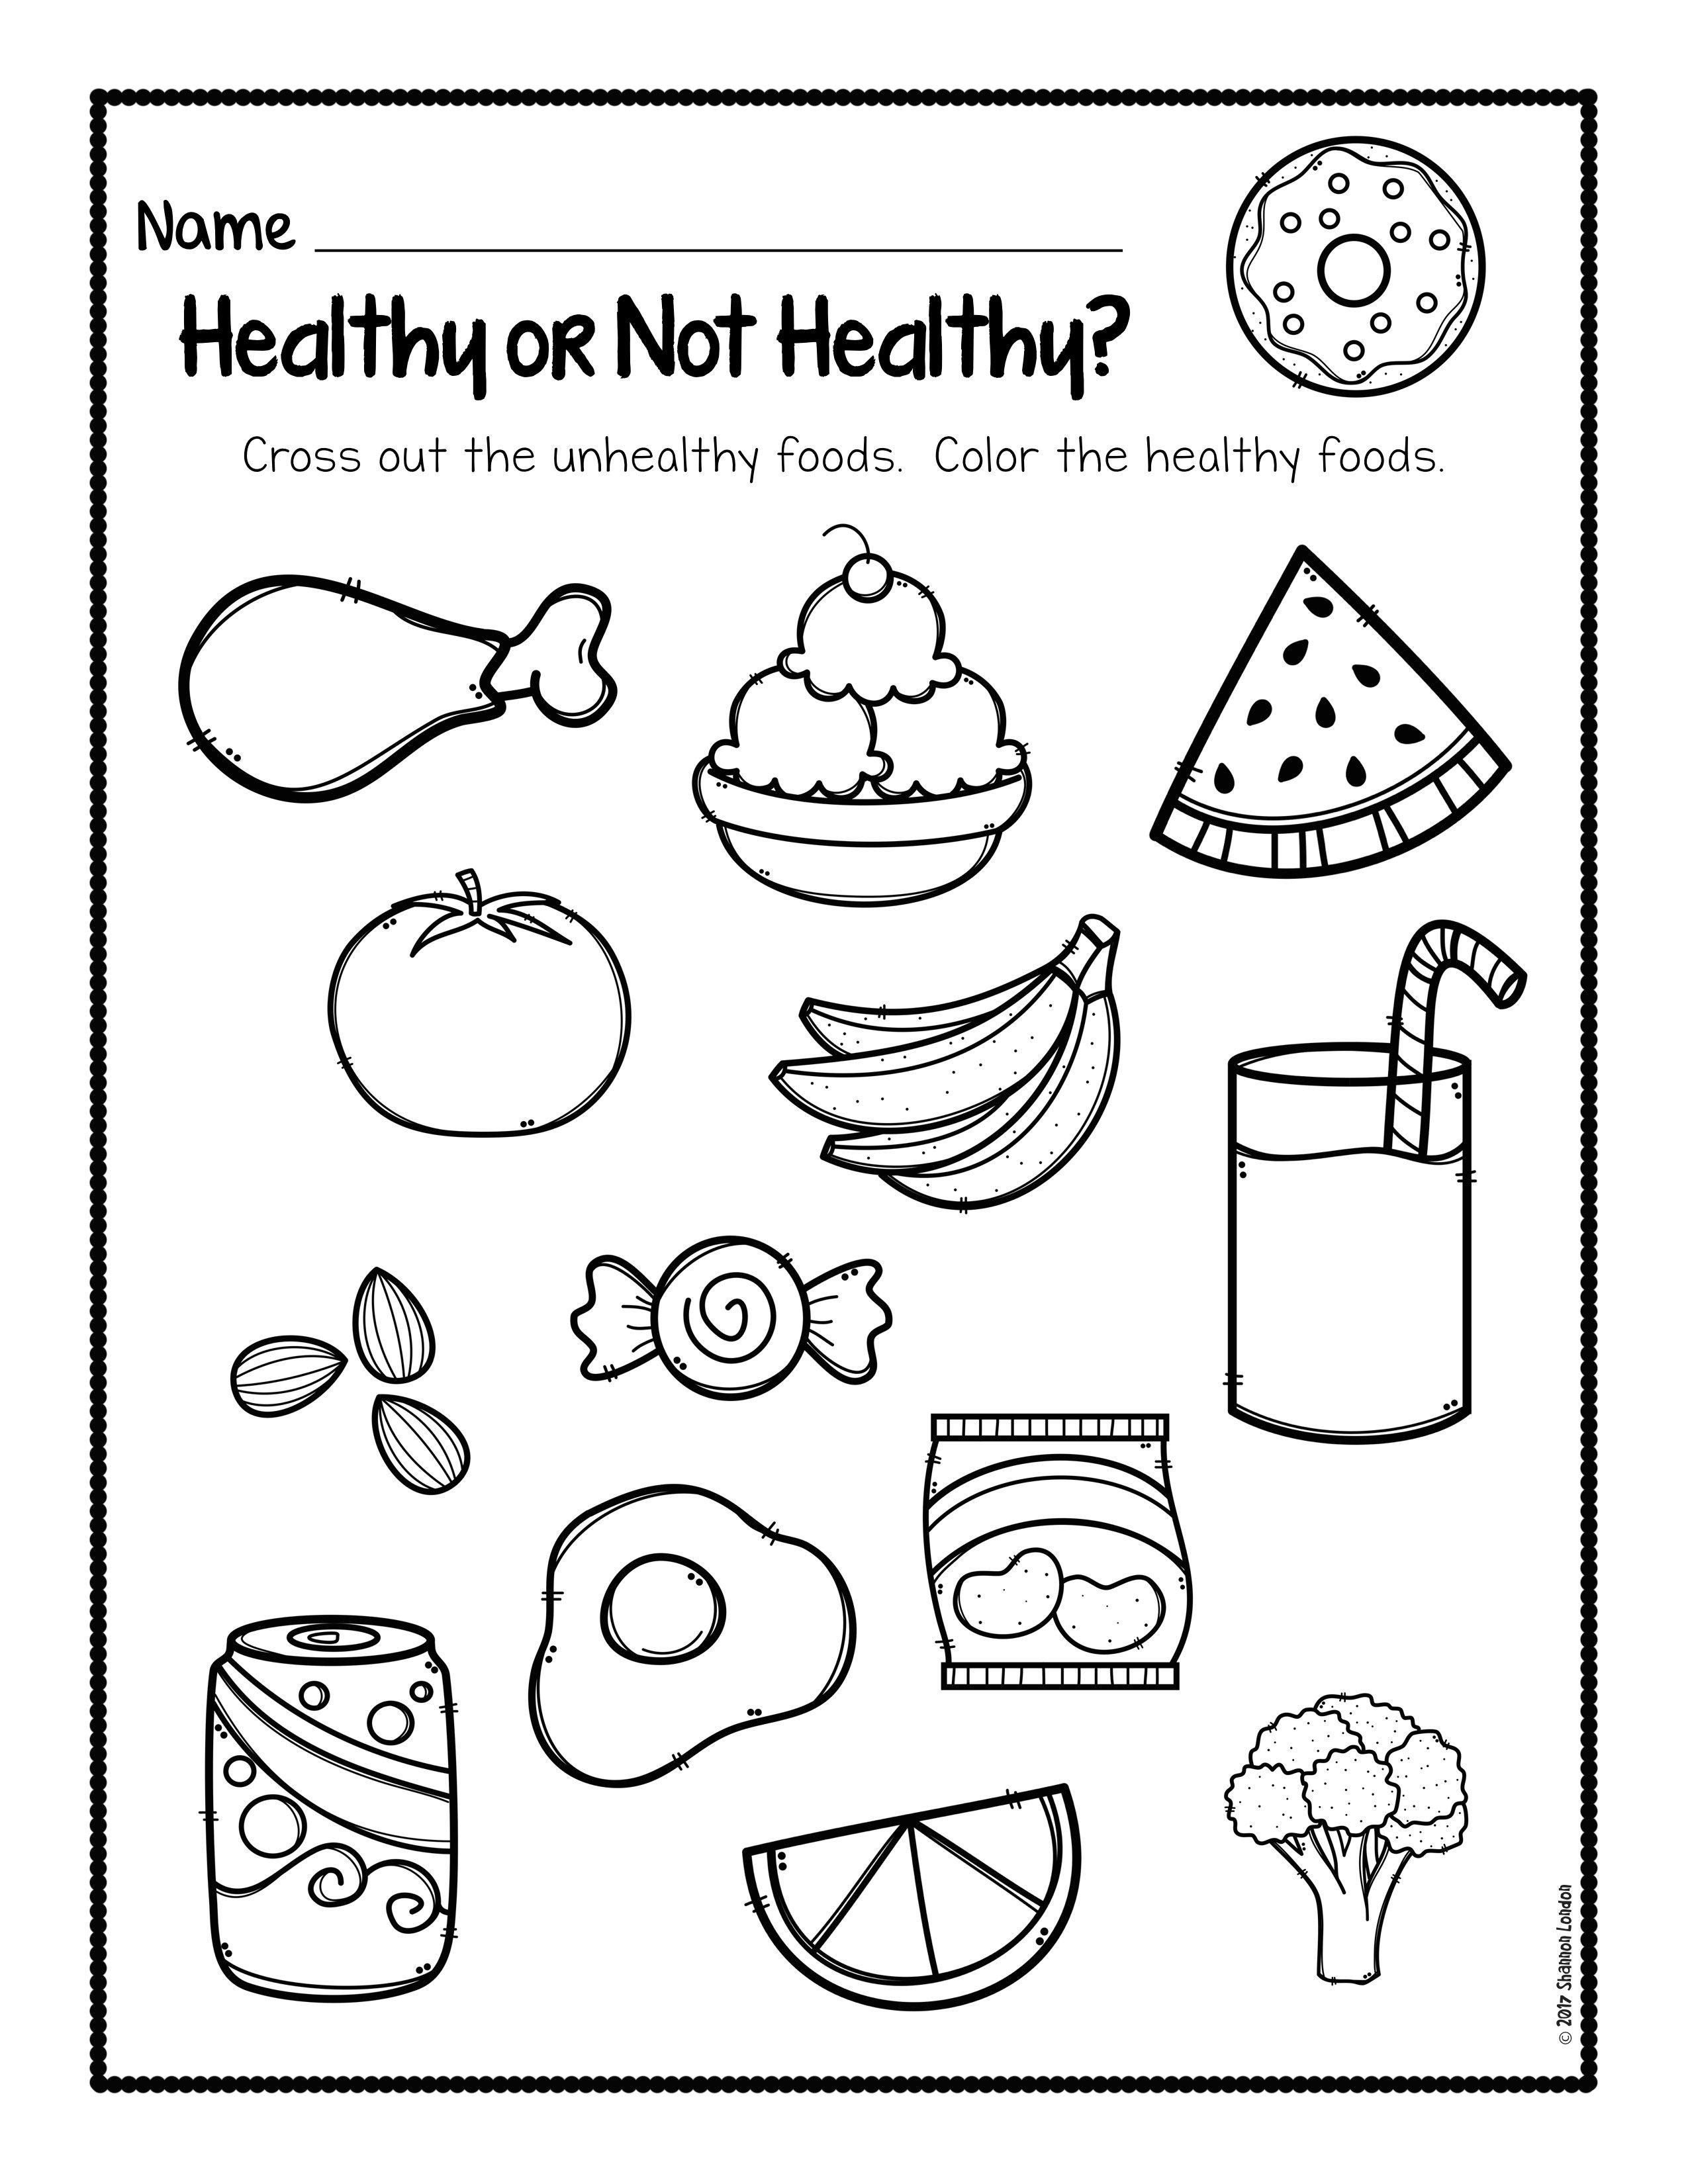 Healthy Or Not Worksheets.001 | Ot Life | Kindergarten Worksheets | Free Printable Cooking Worksheets